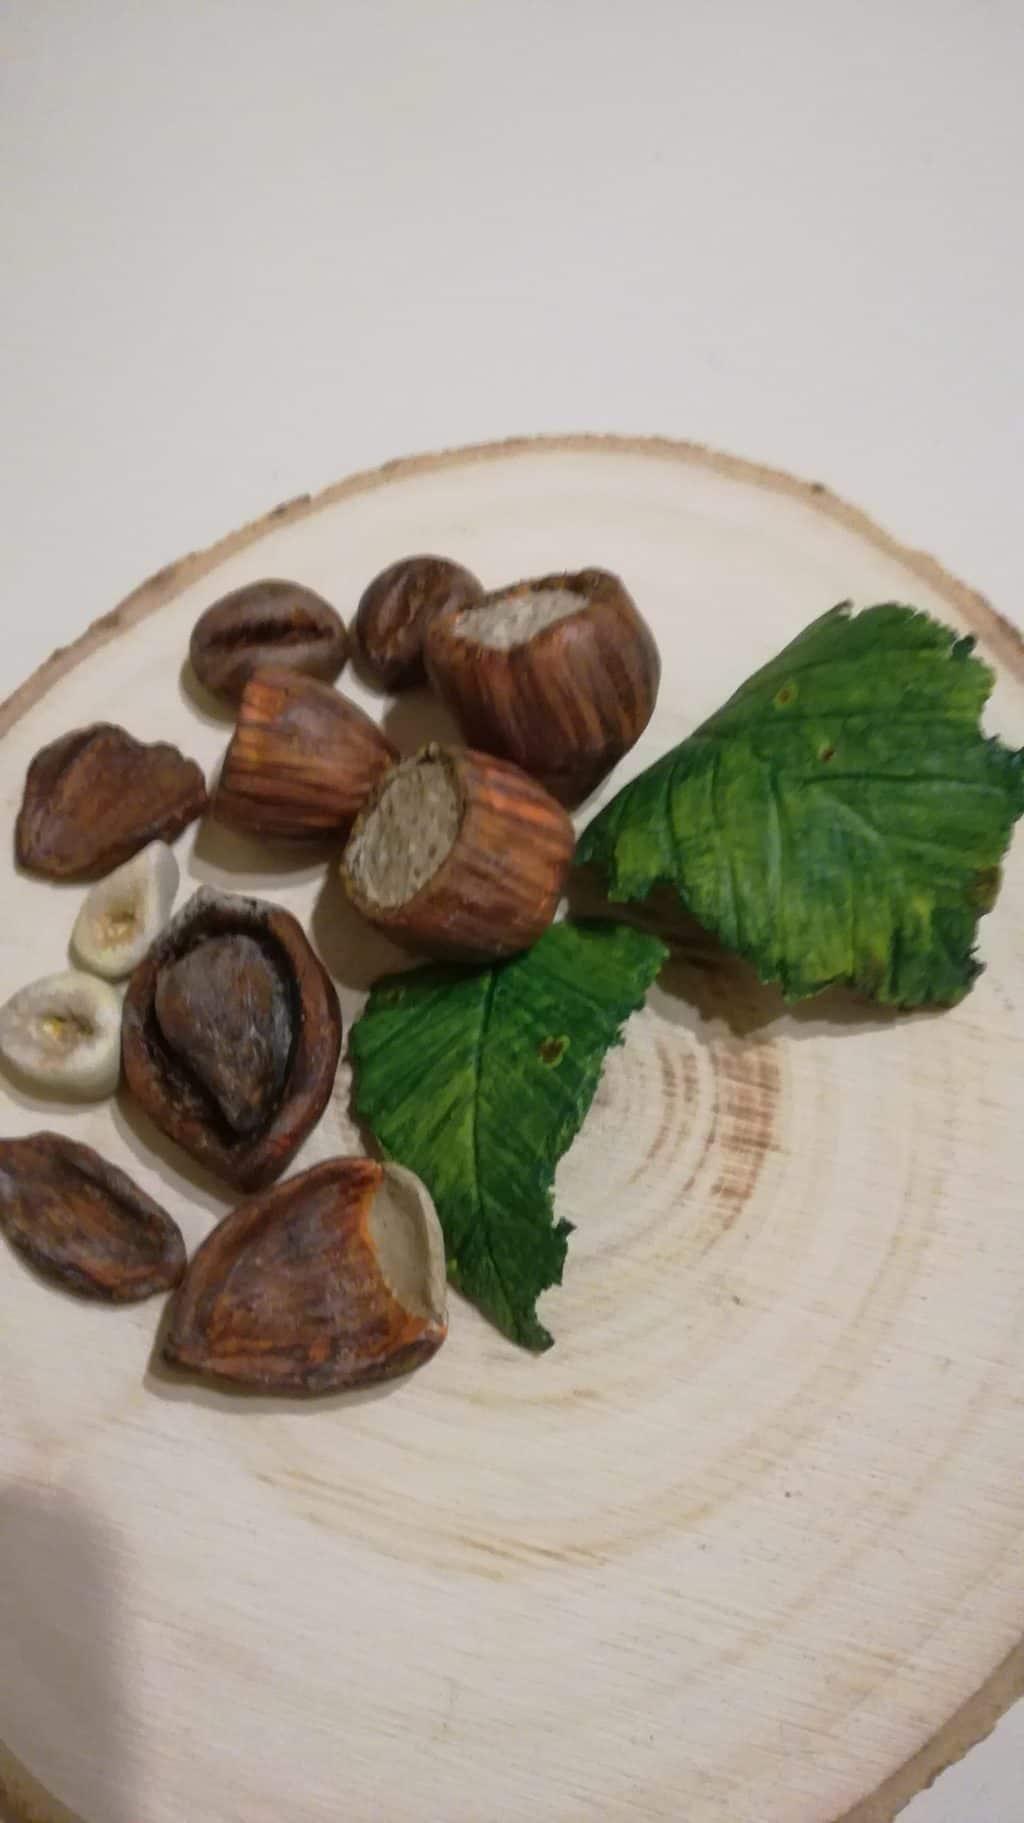 Paper clay hazelnuts